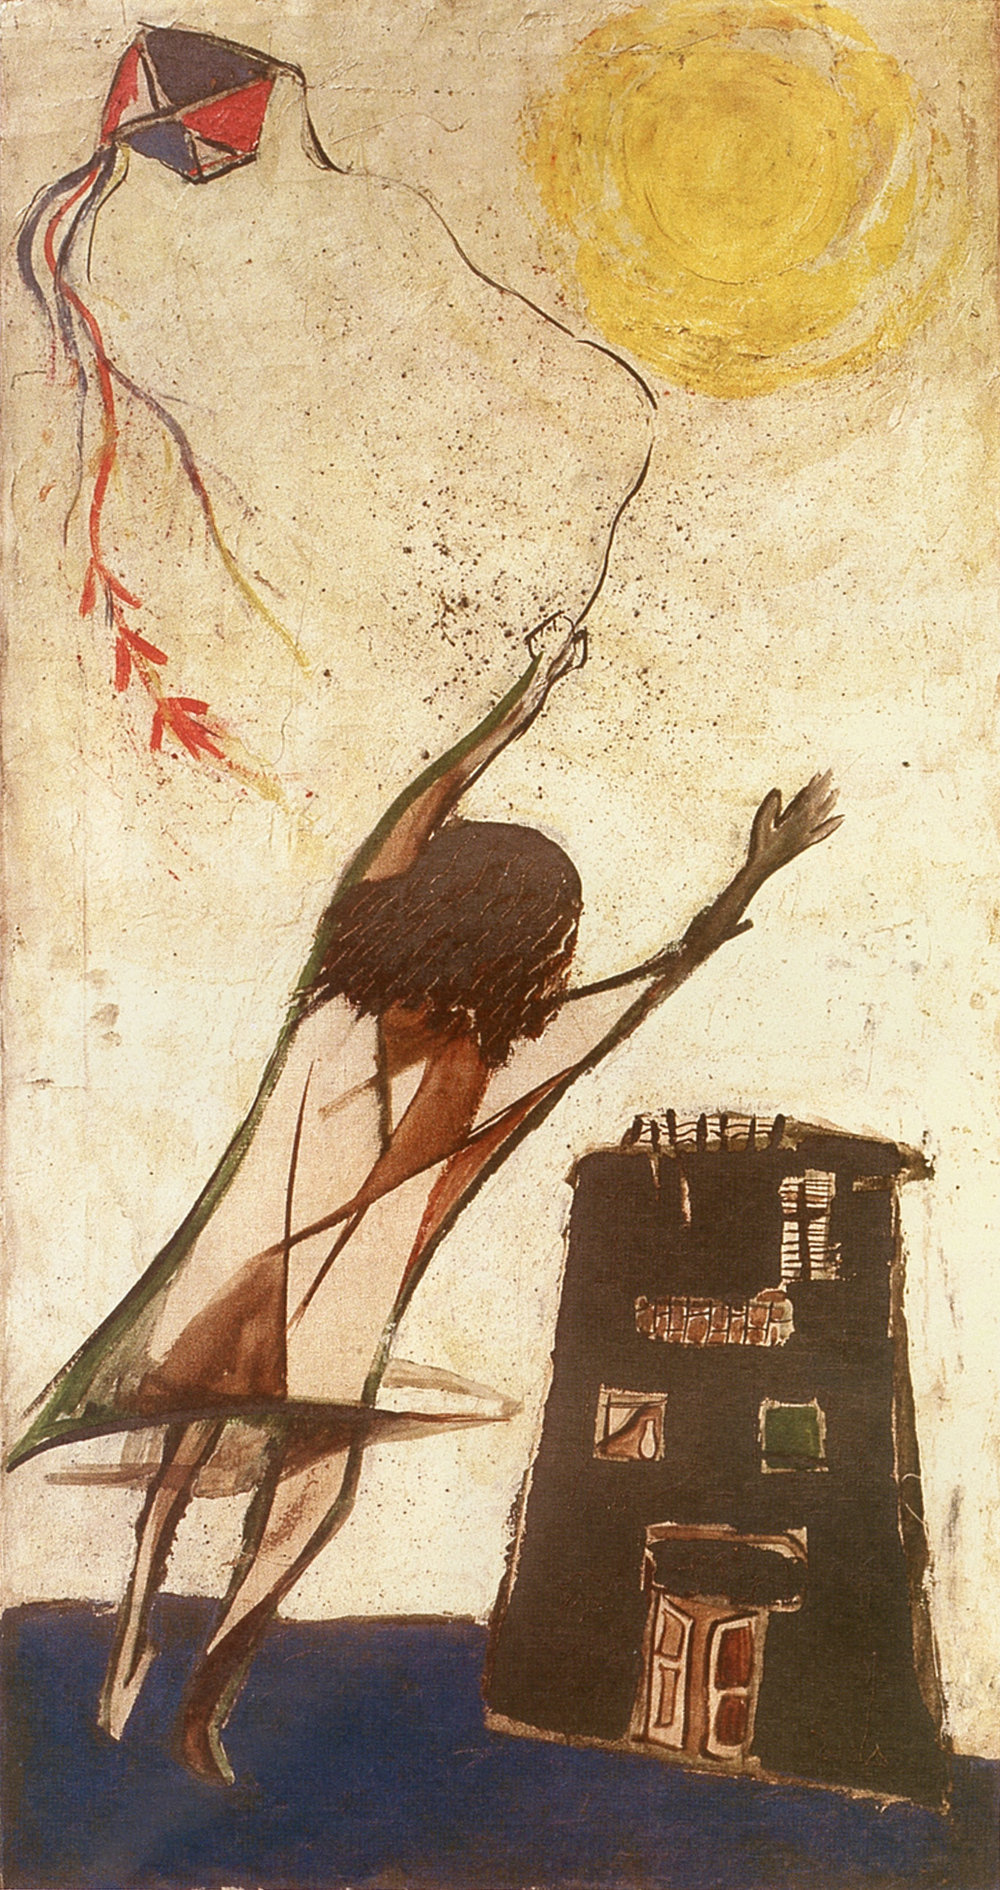 The Kite by Gazbia Sirry (Egyptian b. 1925)via The Met